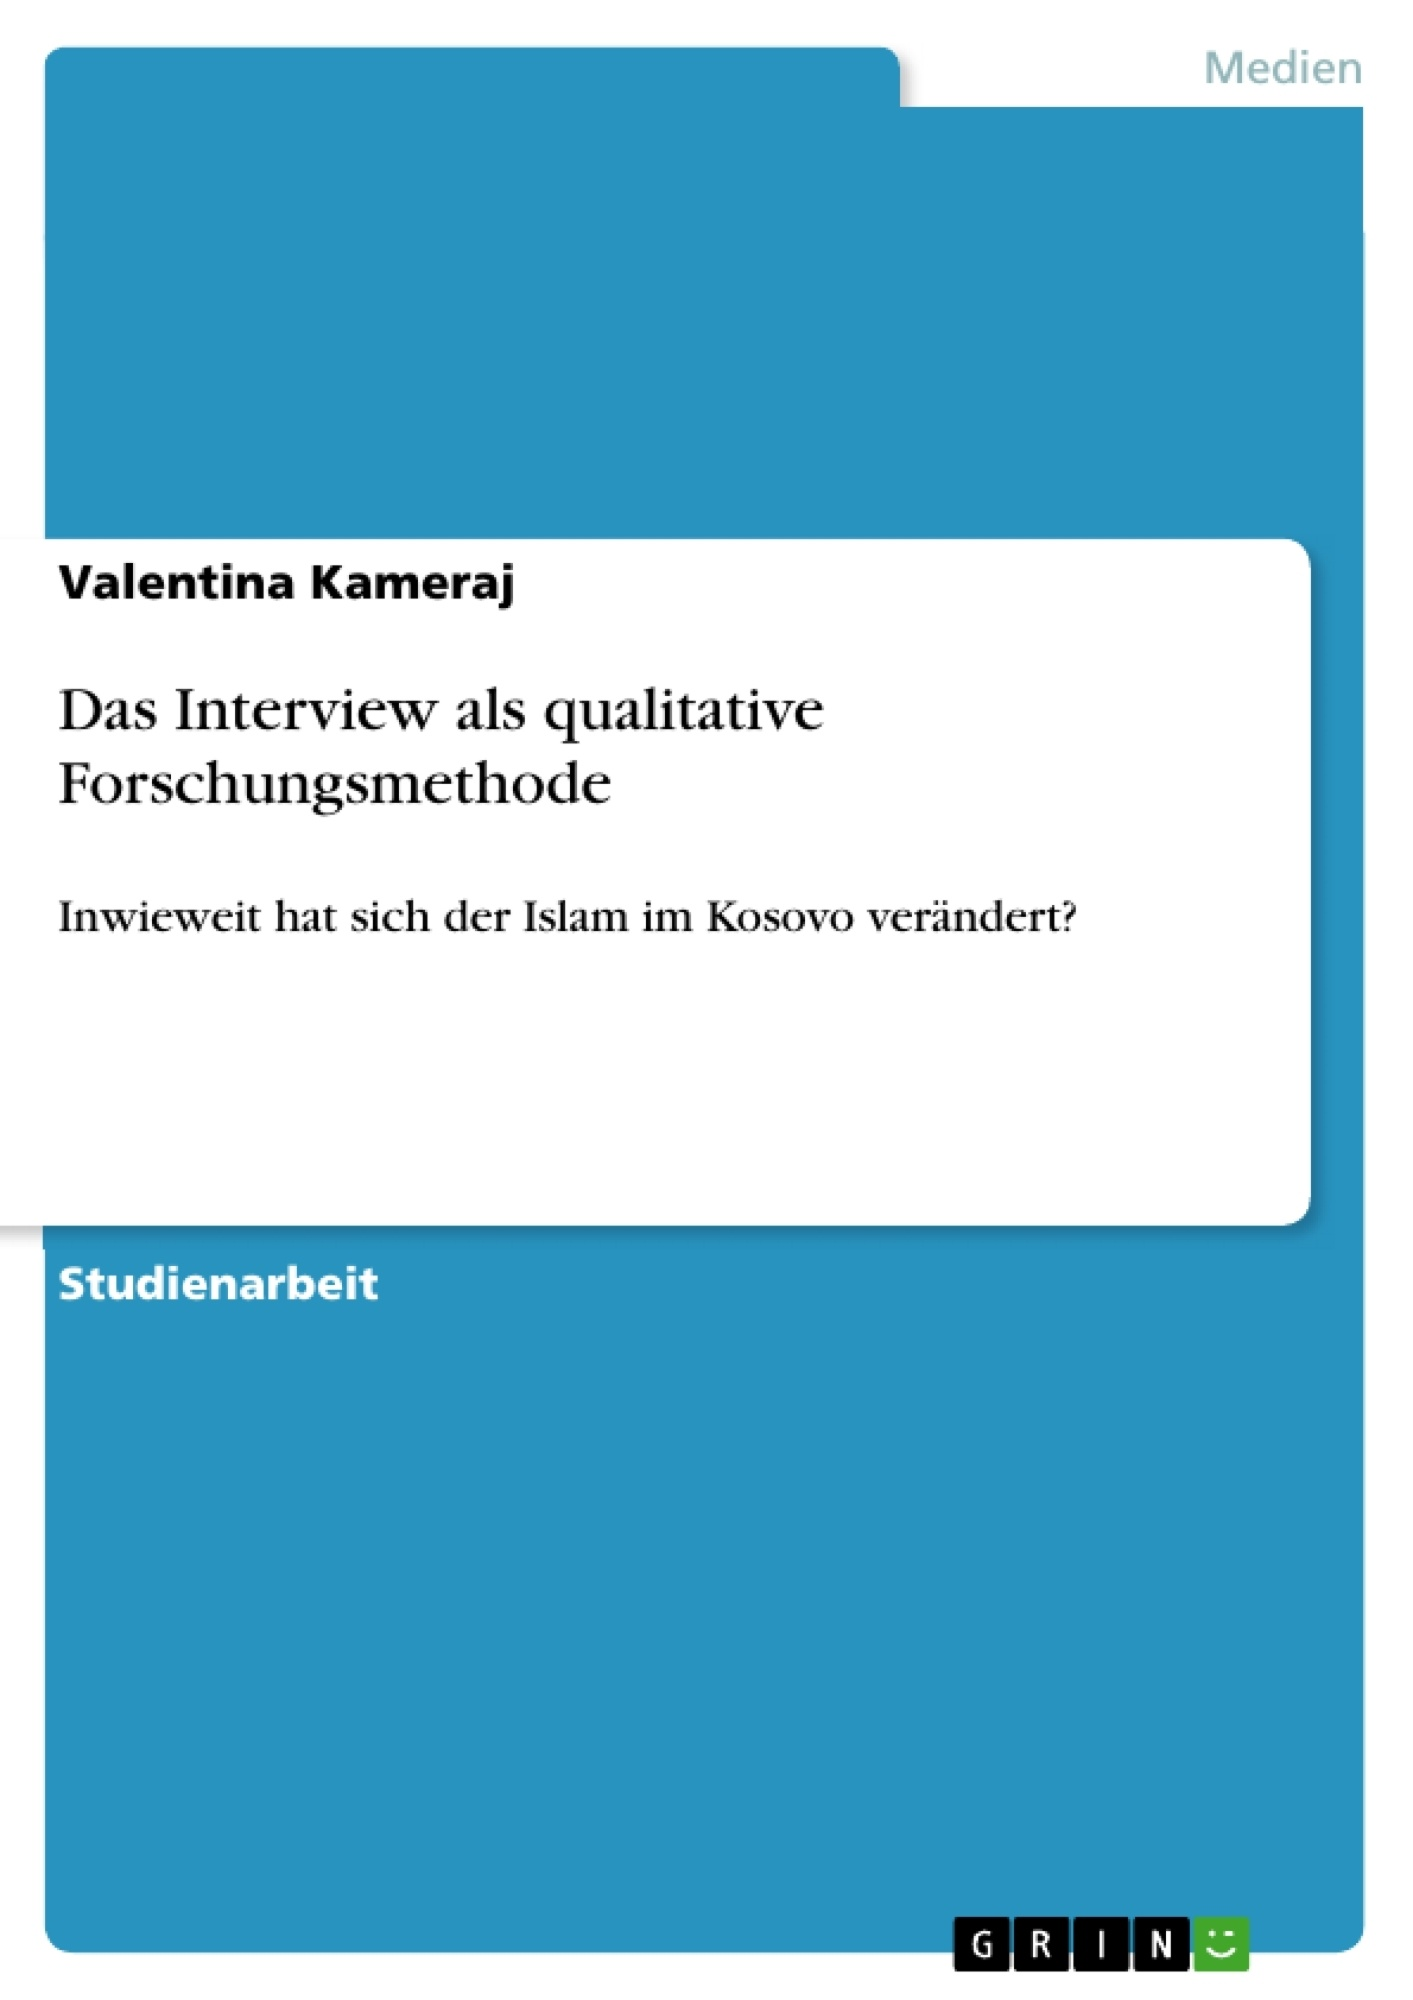 Titel: Das Interview als qualitative Forschungsmethode